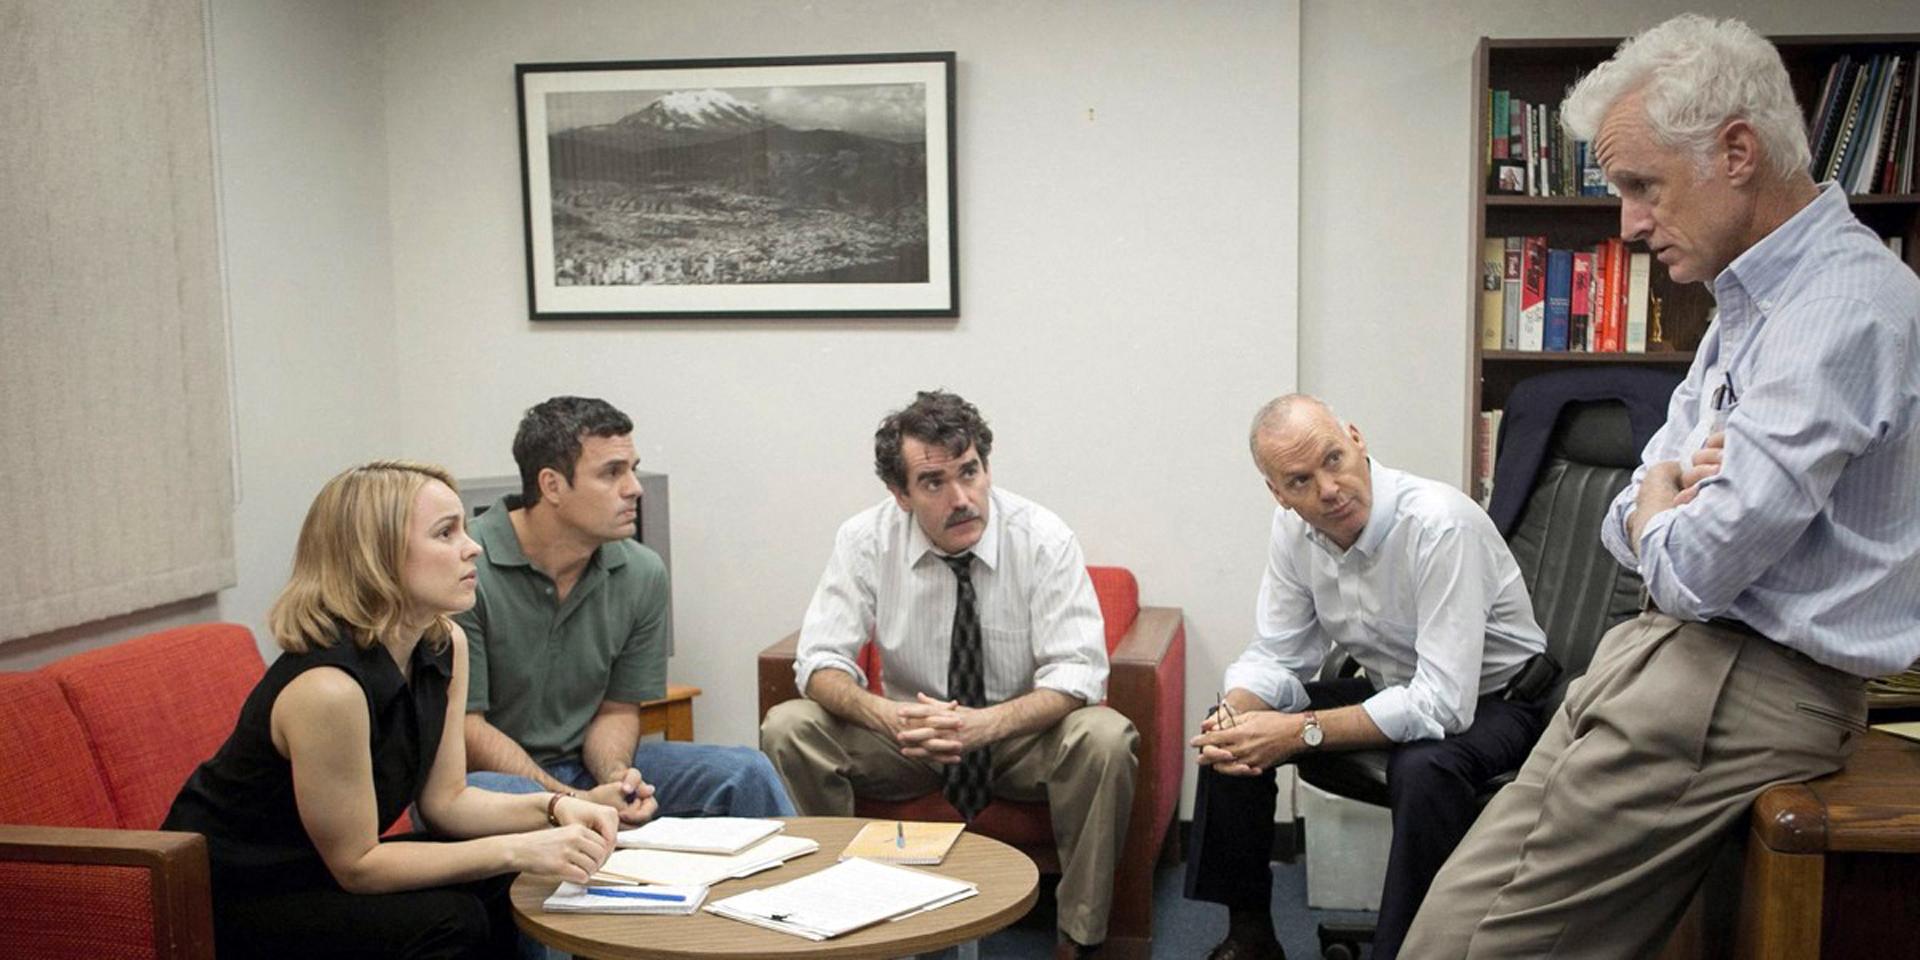 Rachel McAdams, Mark Ruffalo, Brian d'Arcy James, Michael Keaton and John Slattery star in Spotlight.